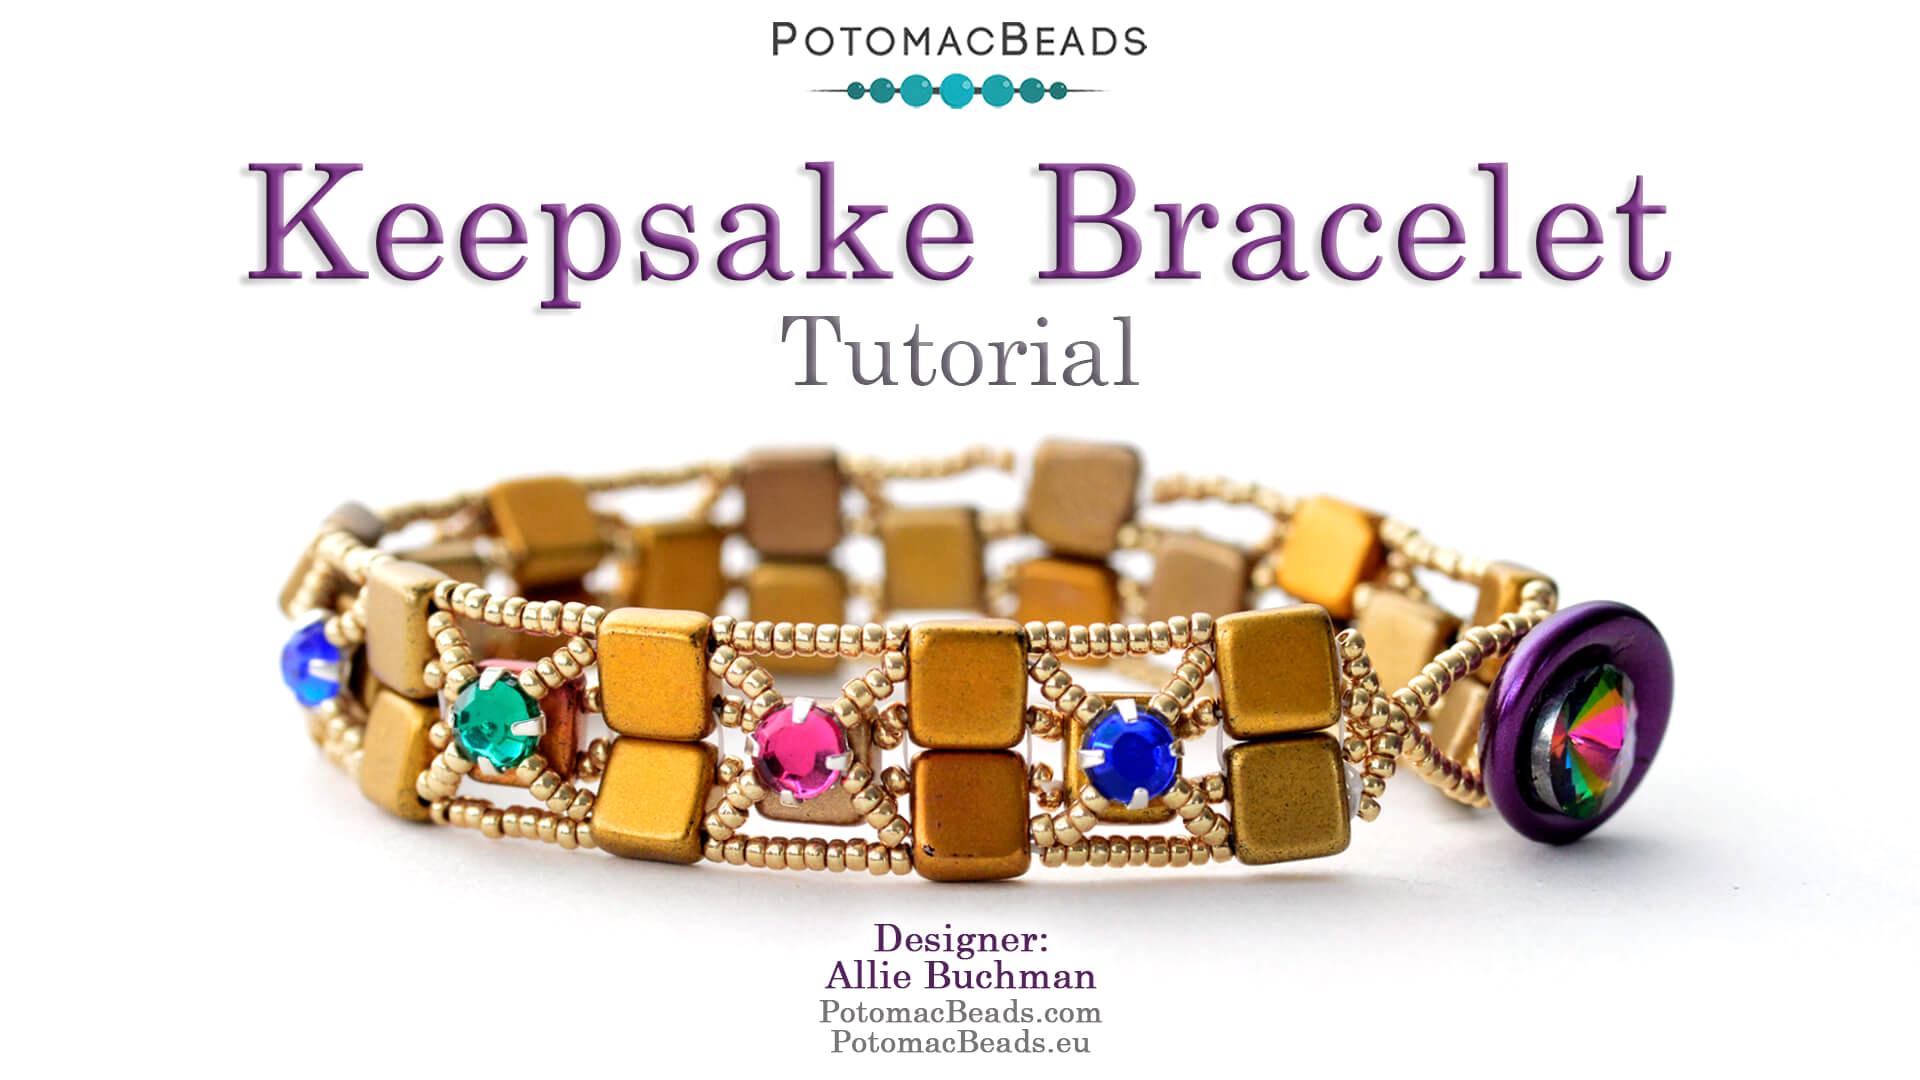 How to Bead / Videos Sorted by Beads / Potomac Crystal Videos / Keepsake Bracelet Tutorial